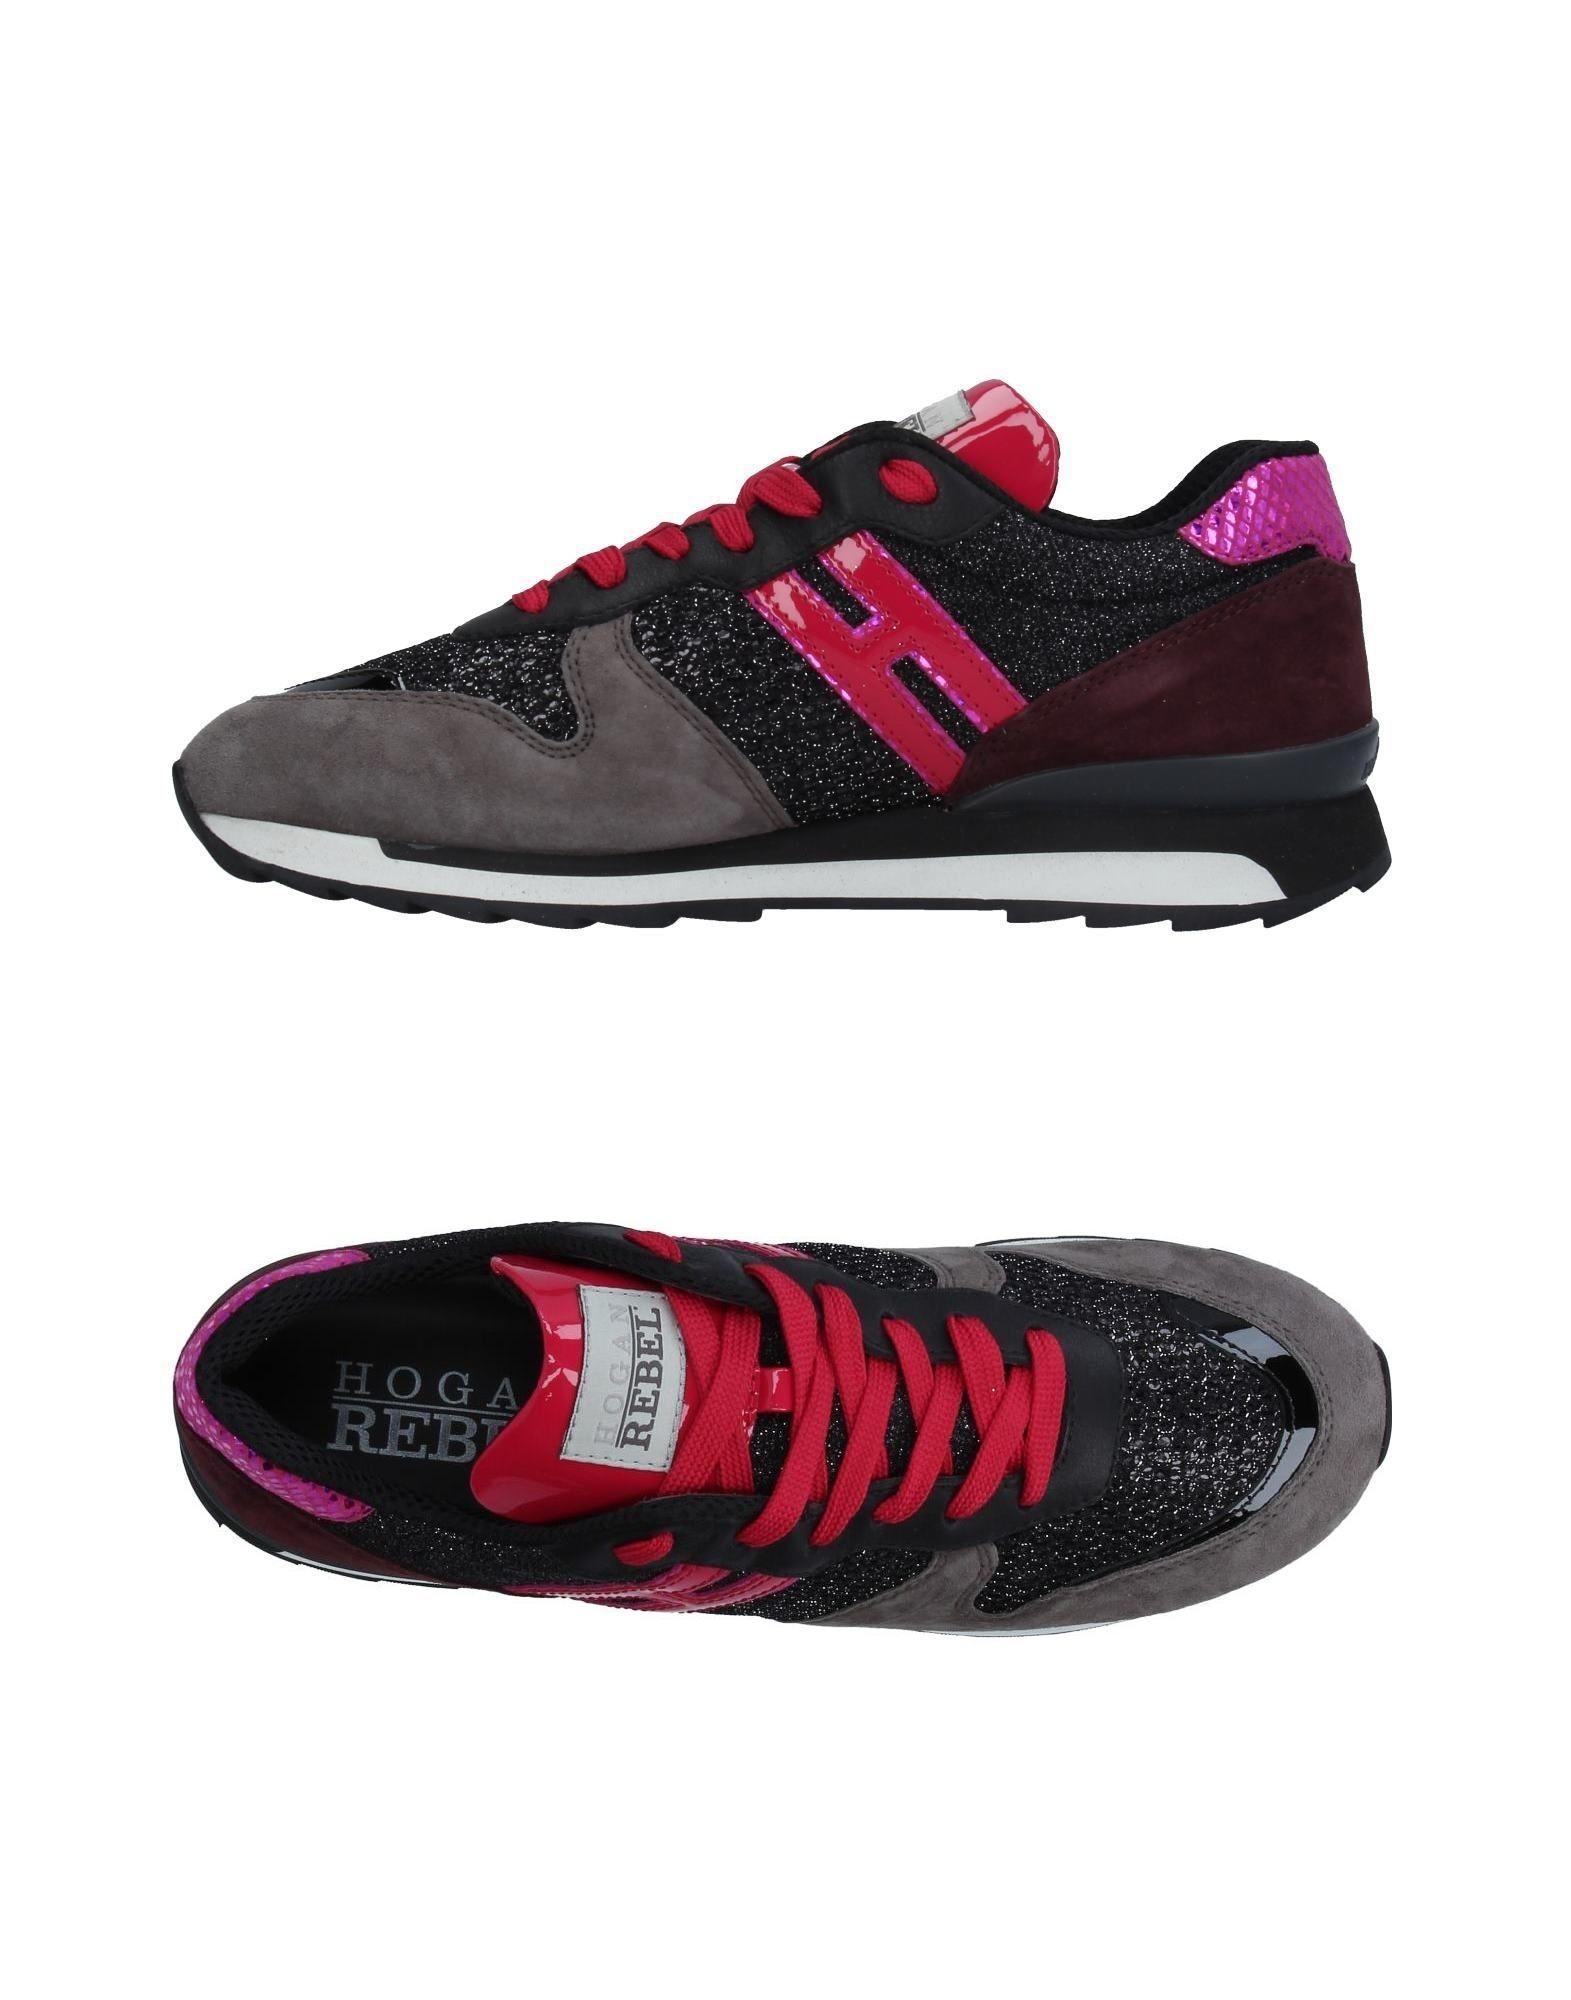 HOGAN REBEL Sneakers in Grey